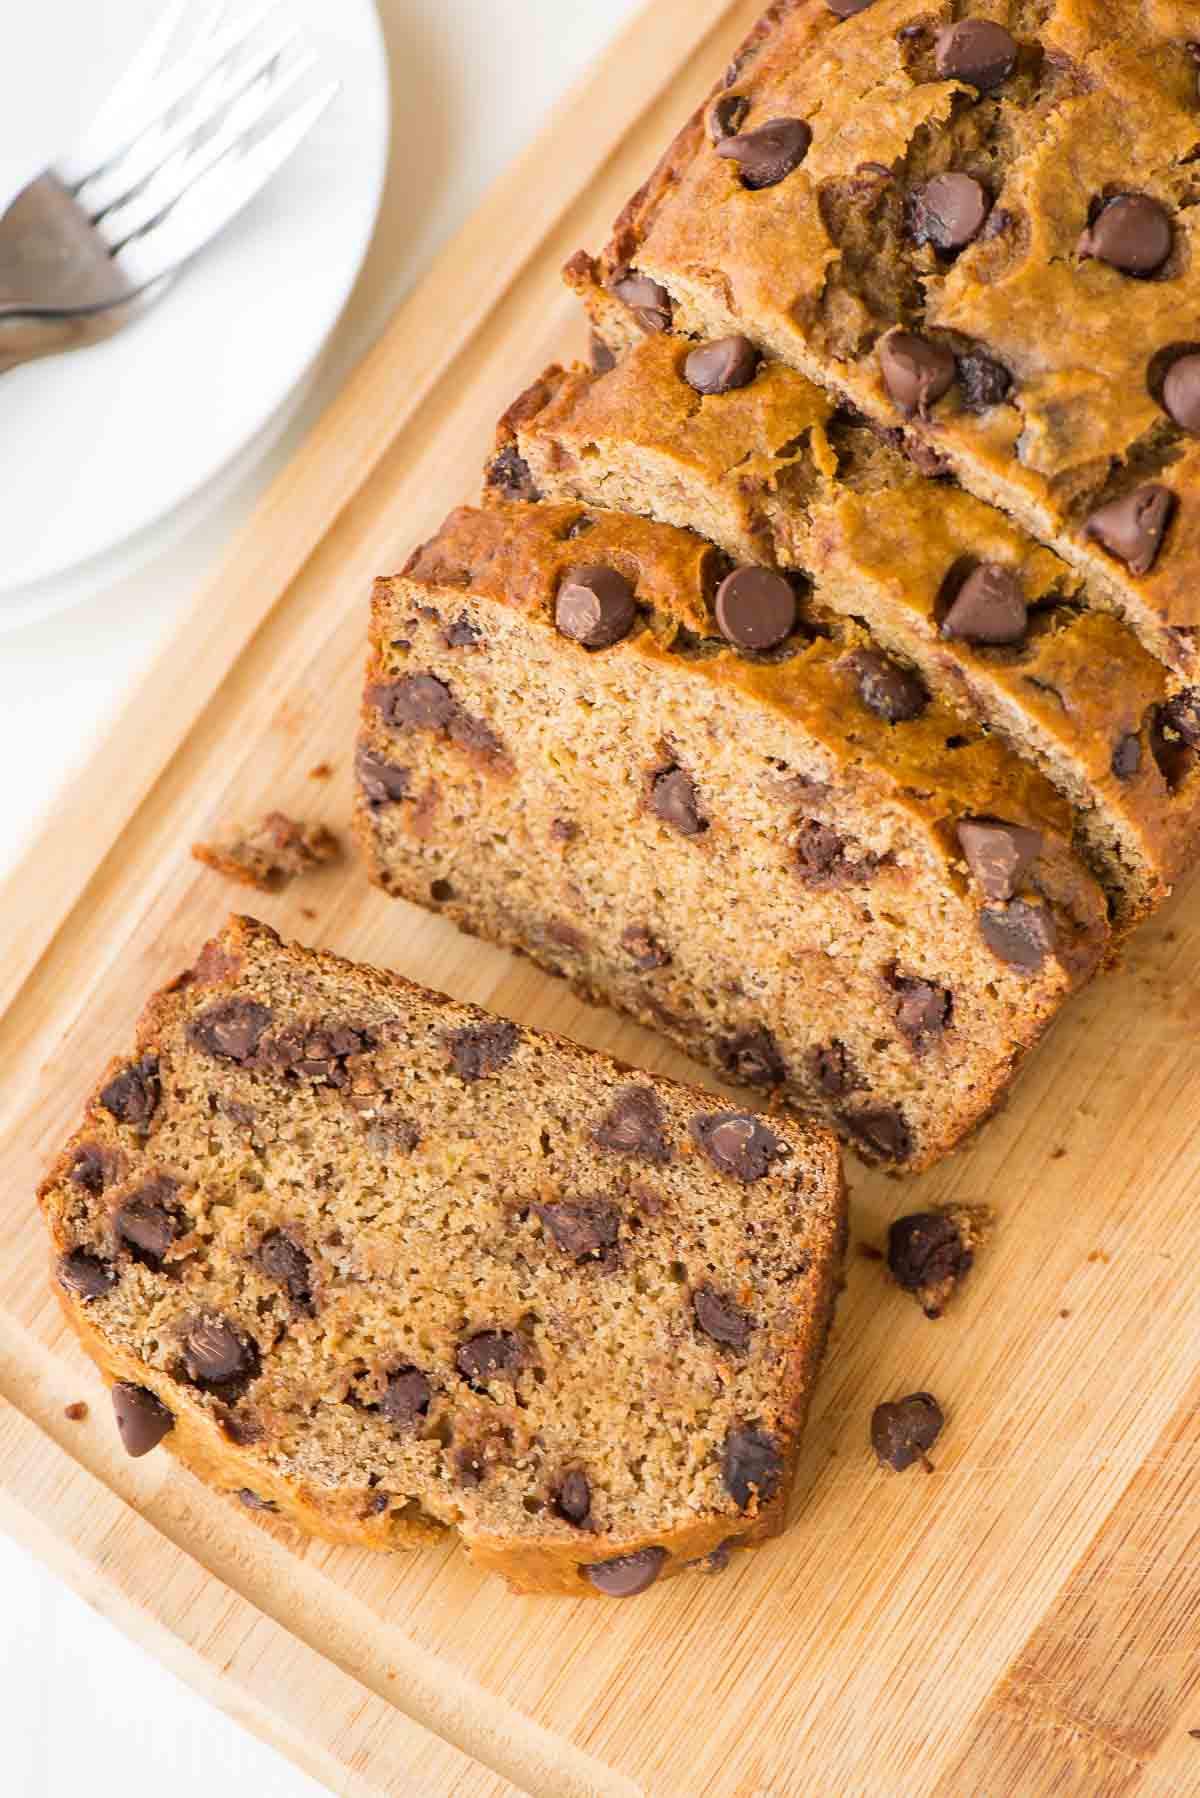 Simple Healthy Banana Bread Recipe  Healthy Banana Bread Recipe with Chocolate Chips